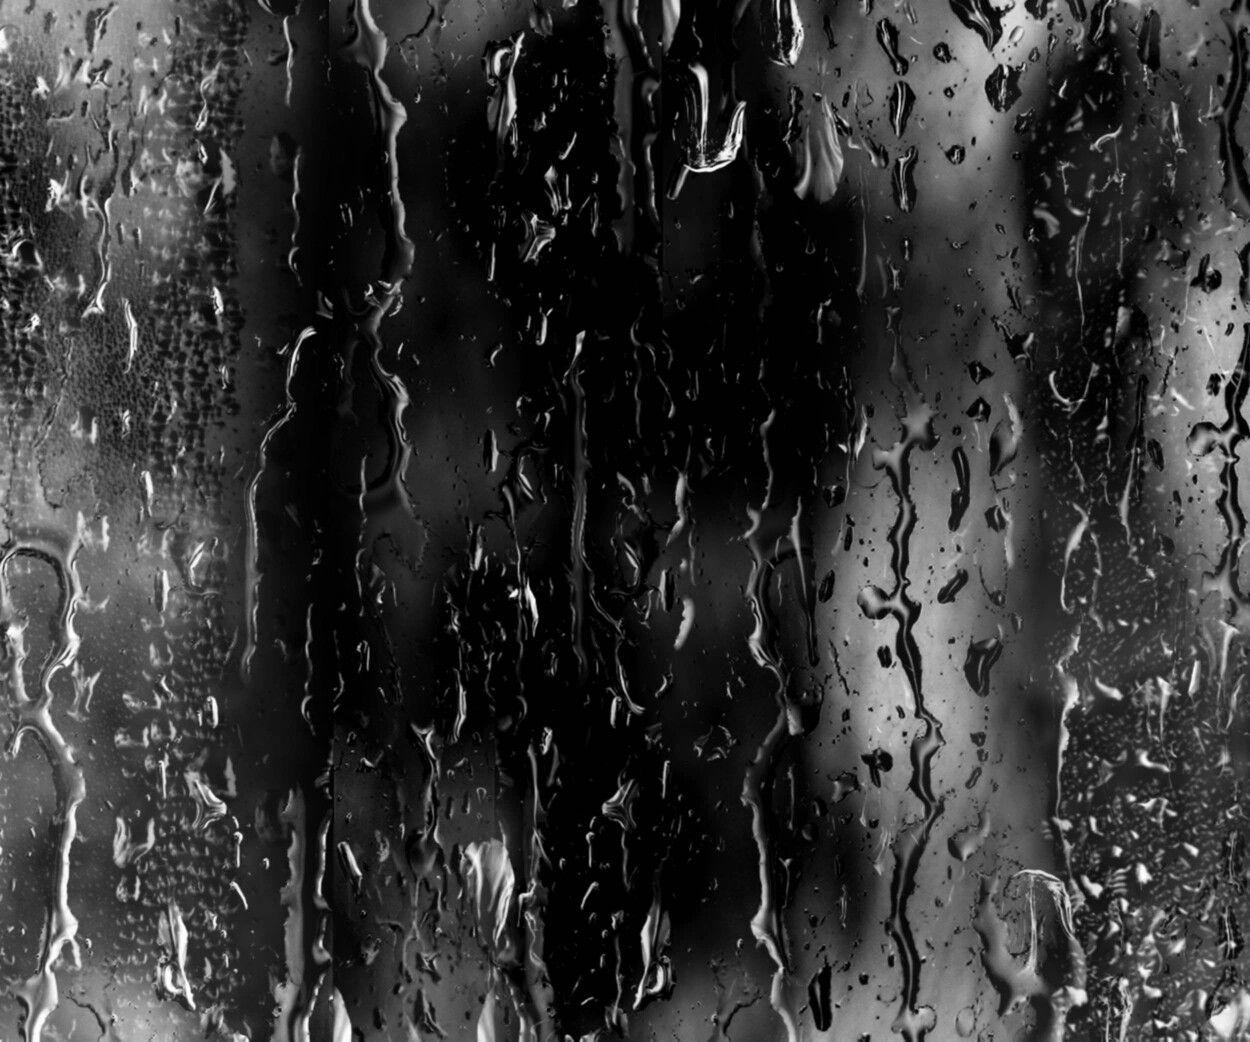 Pin By Picsart Editing Png On Water Drop Png Abstract Artwork Abstract Artwork